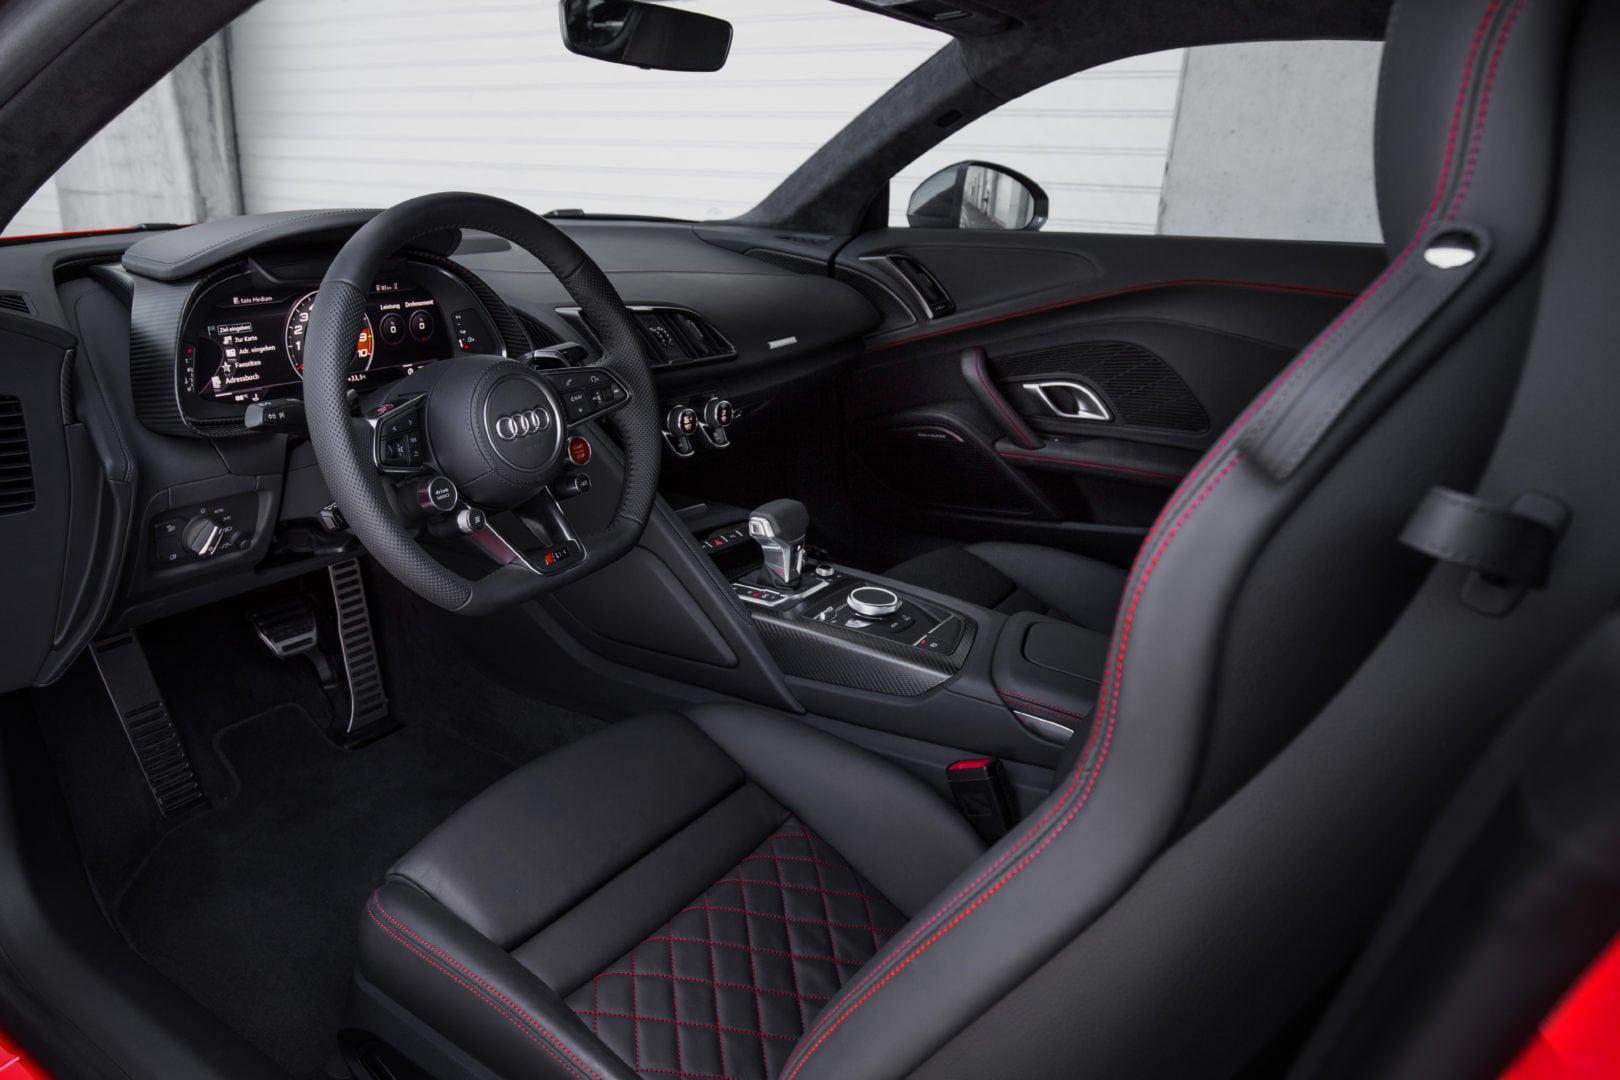 2016 R8 cockpit